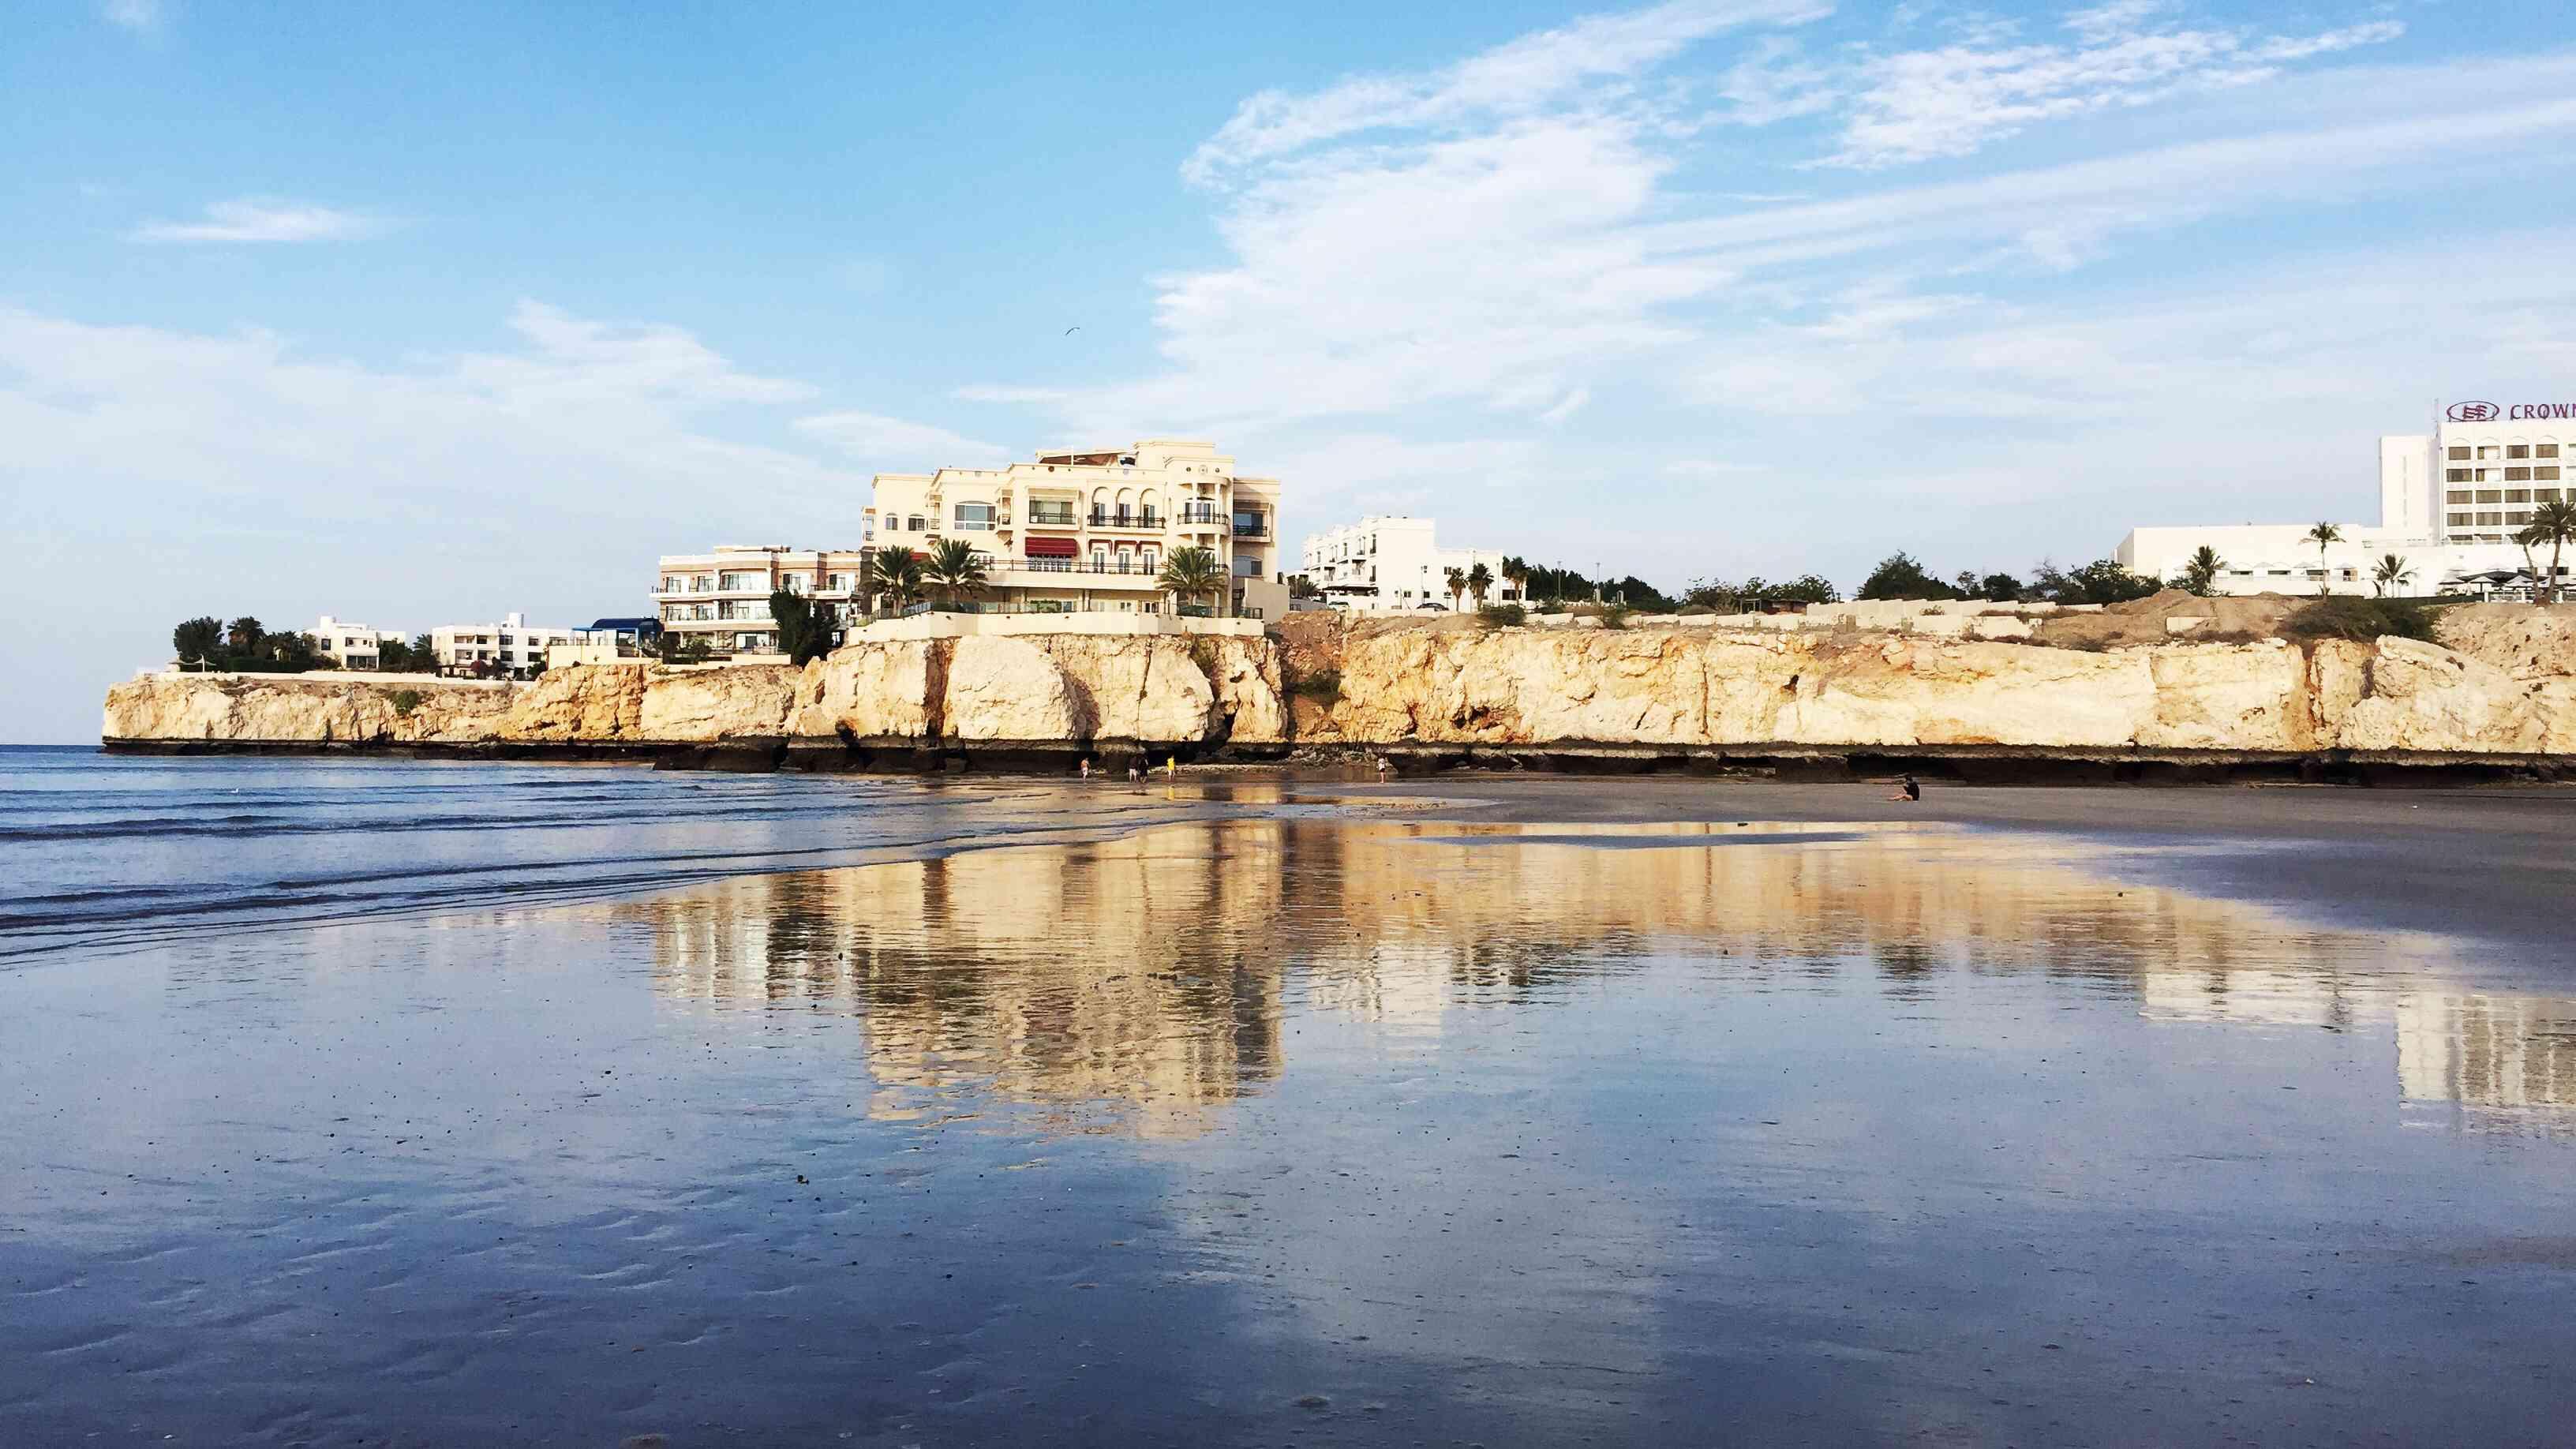 Reflection in water at Al Qurum Beach